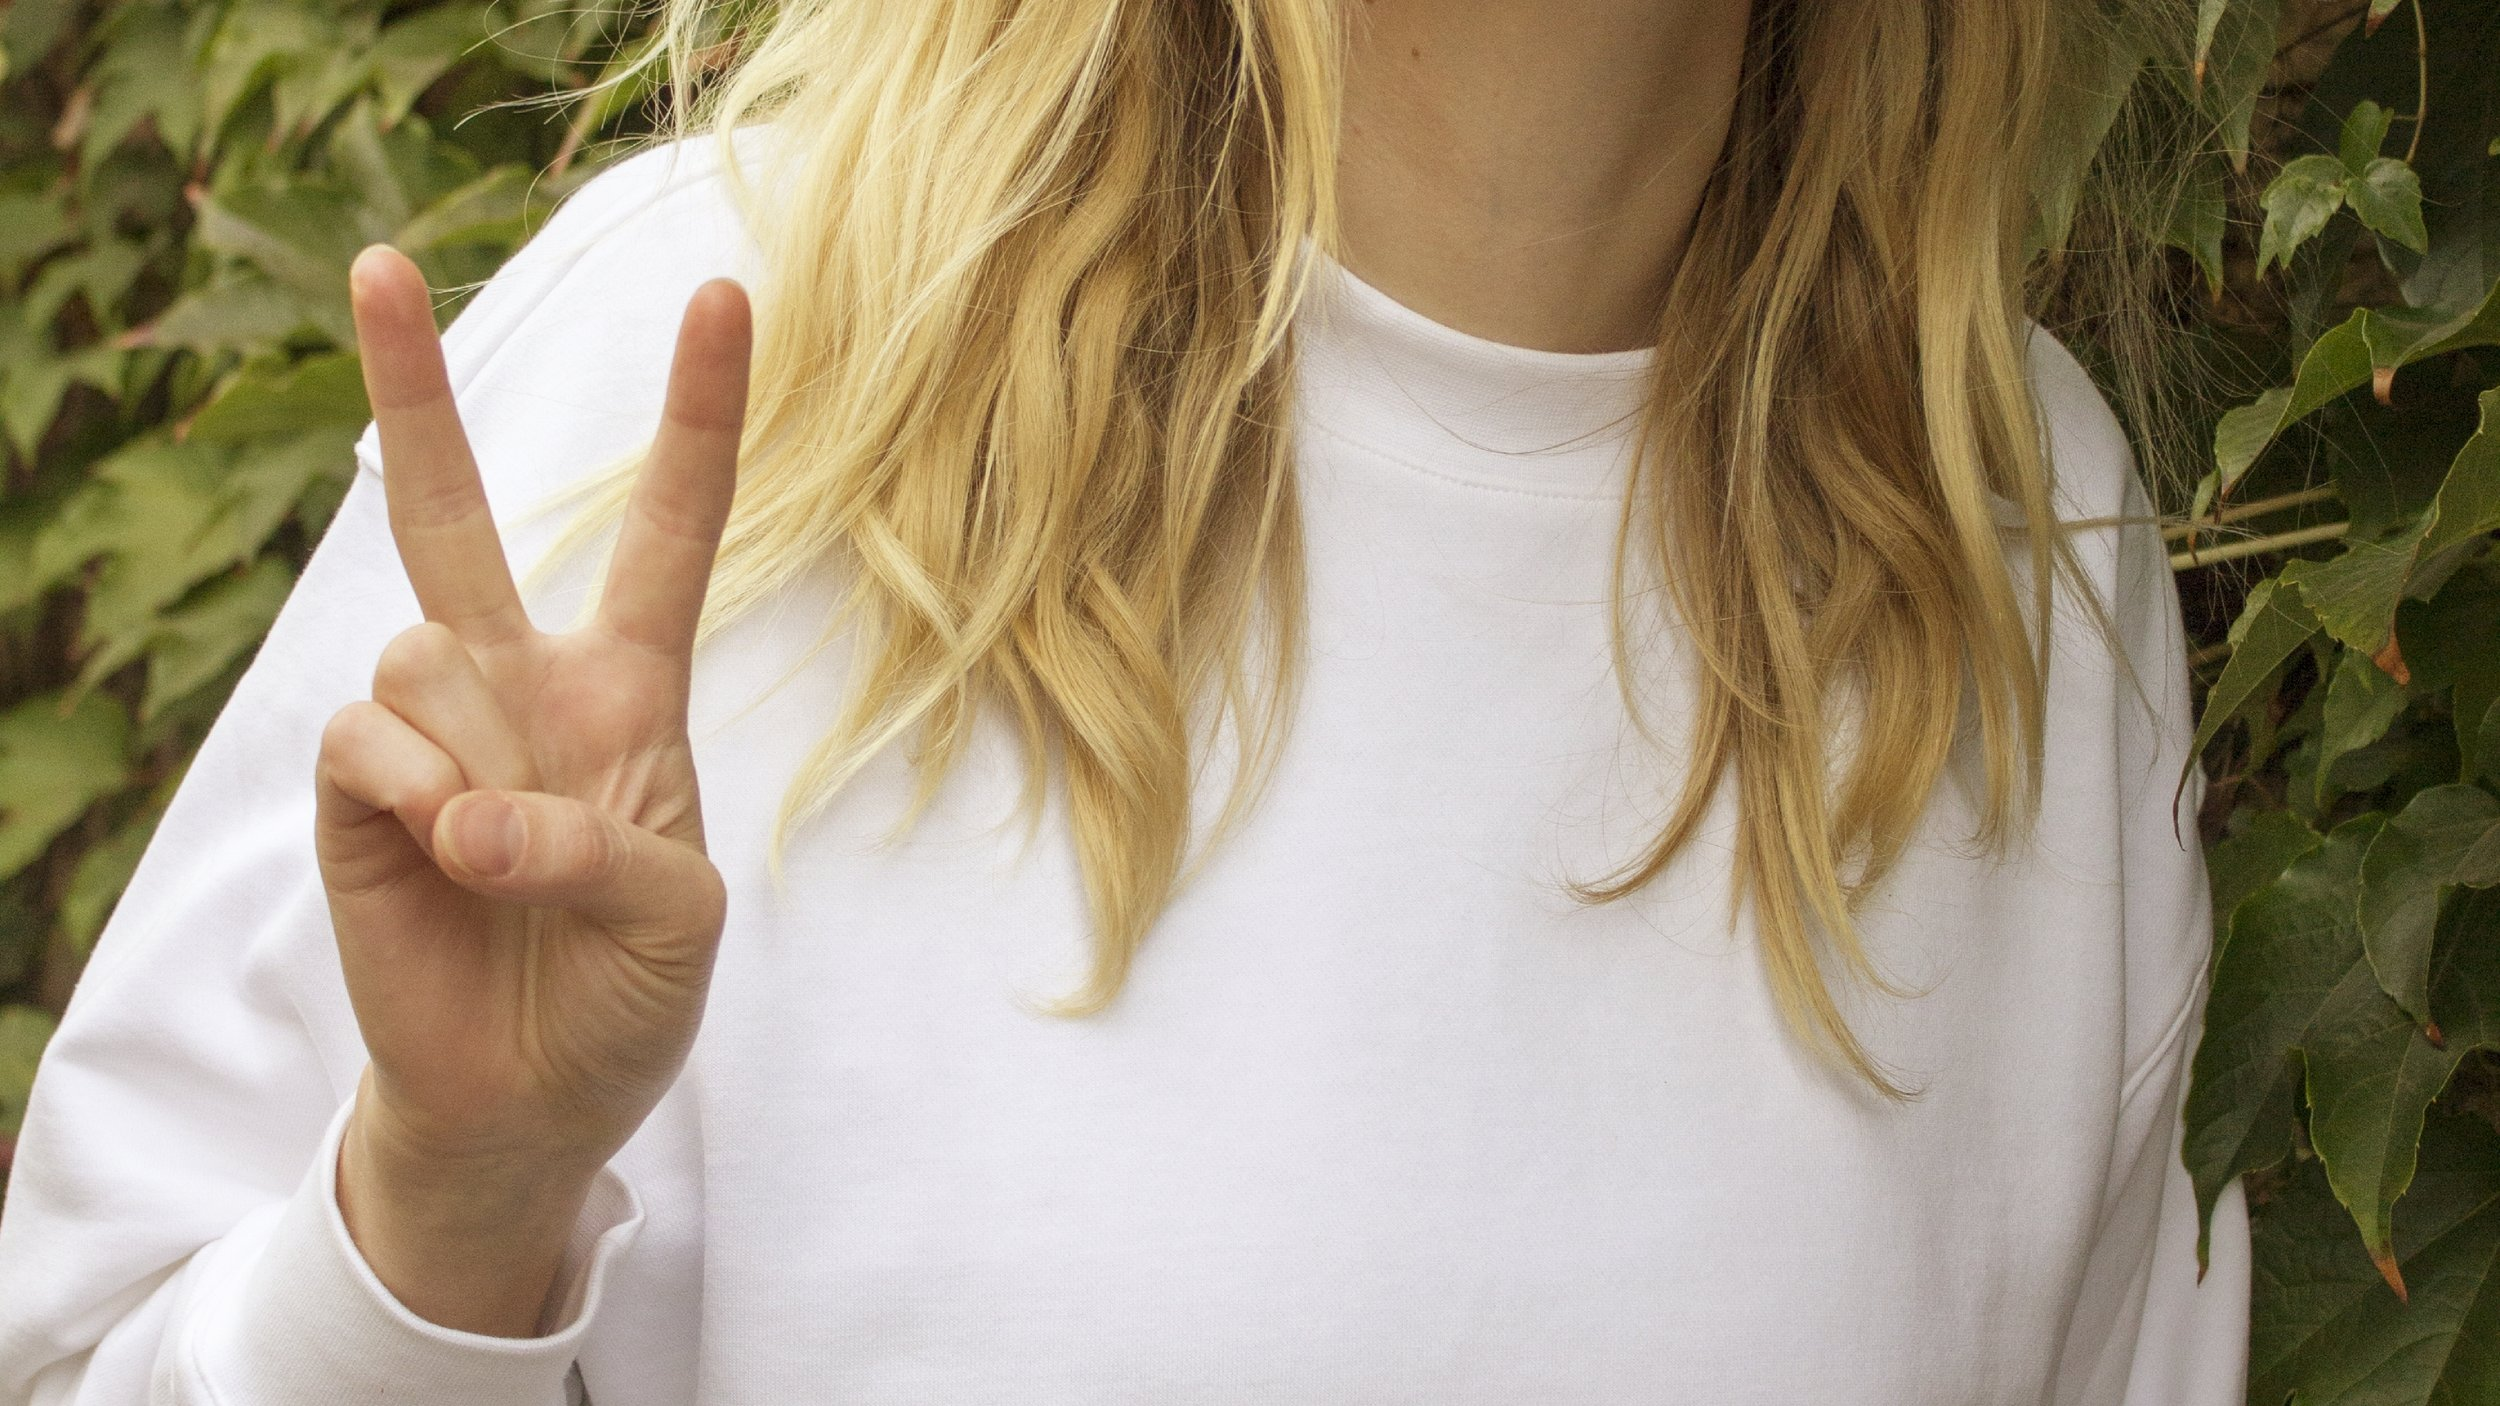 Romana doing peace hand sign